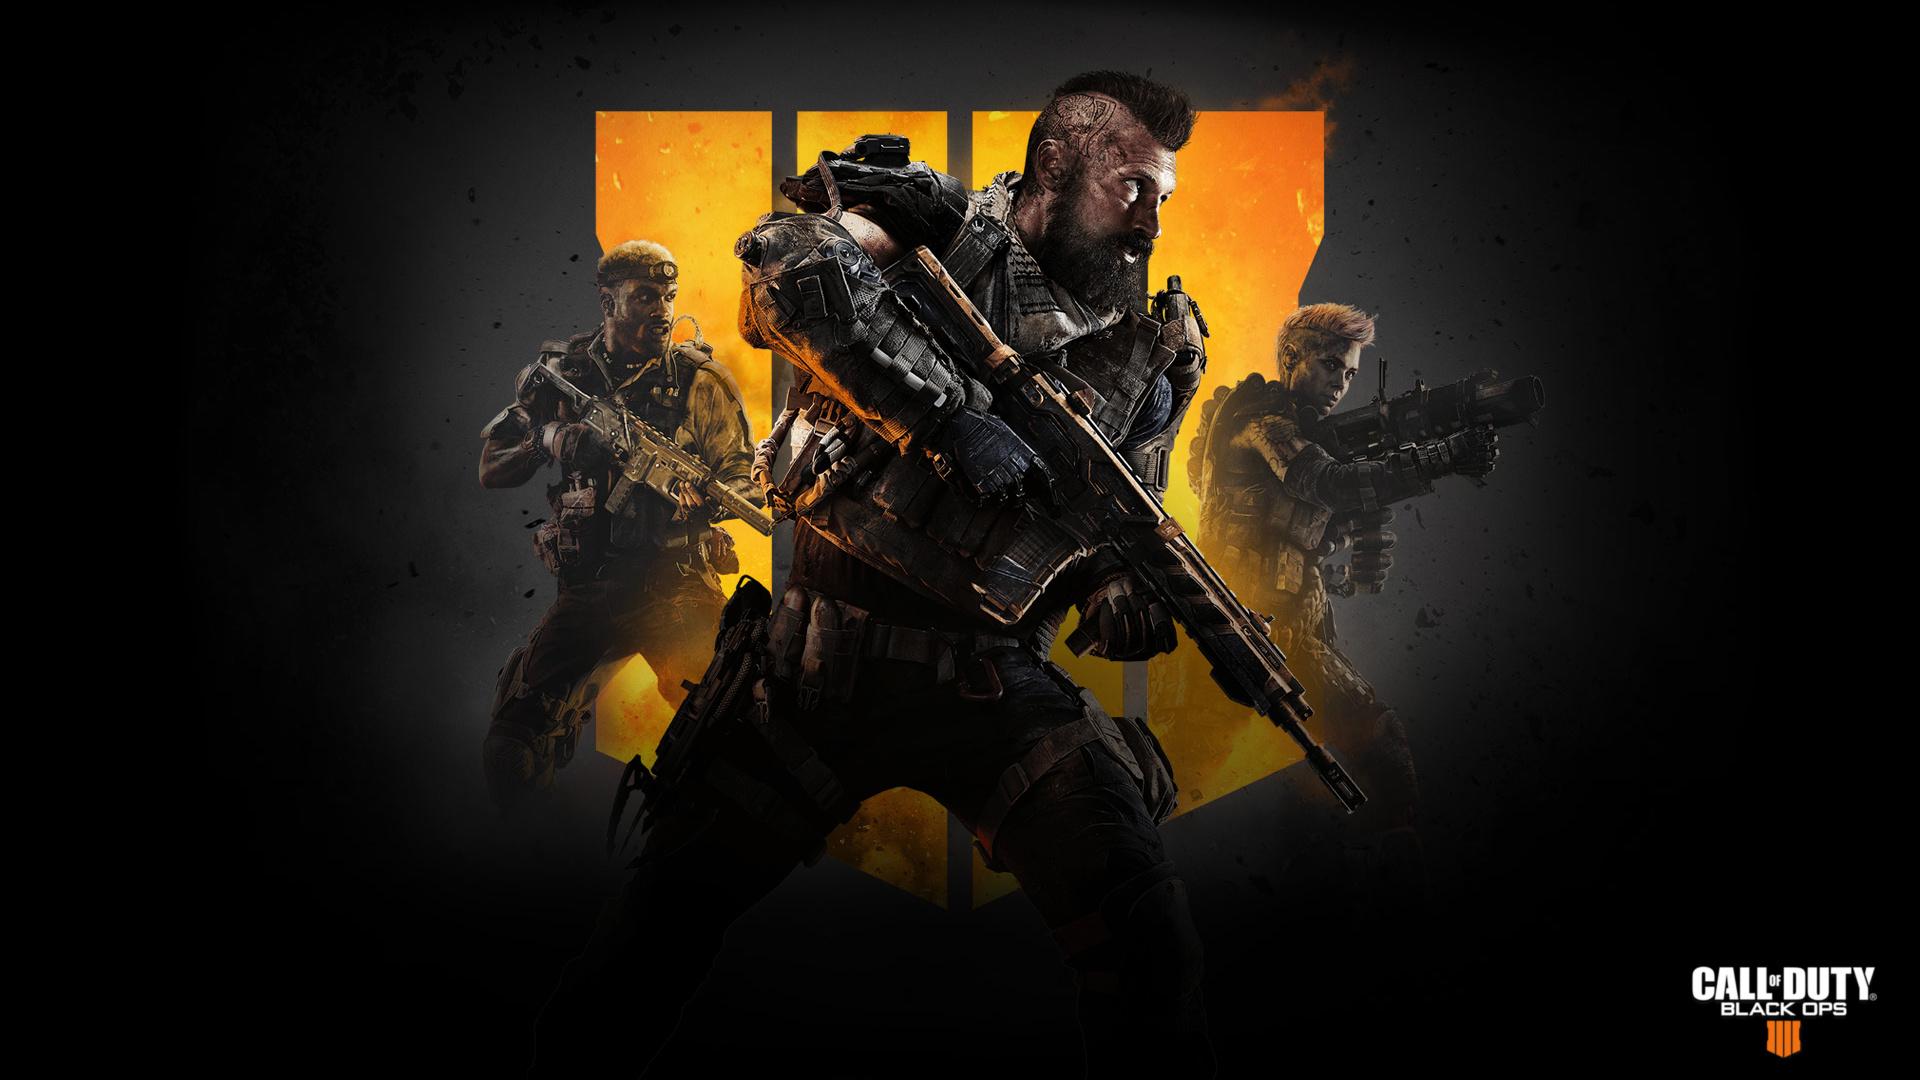 Desktop wallpaper call of duty black ops 4 soldiers video game 1920x1080